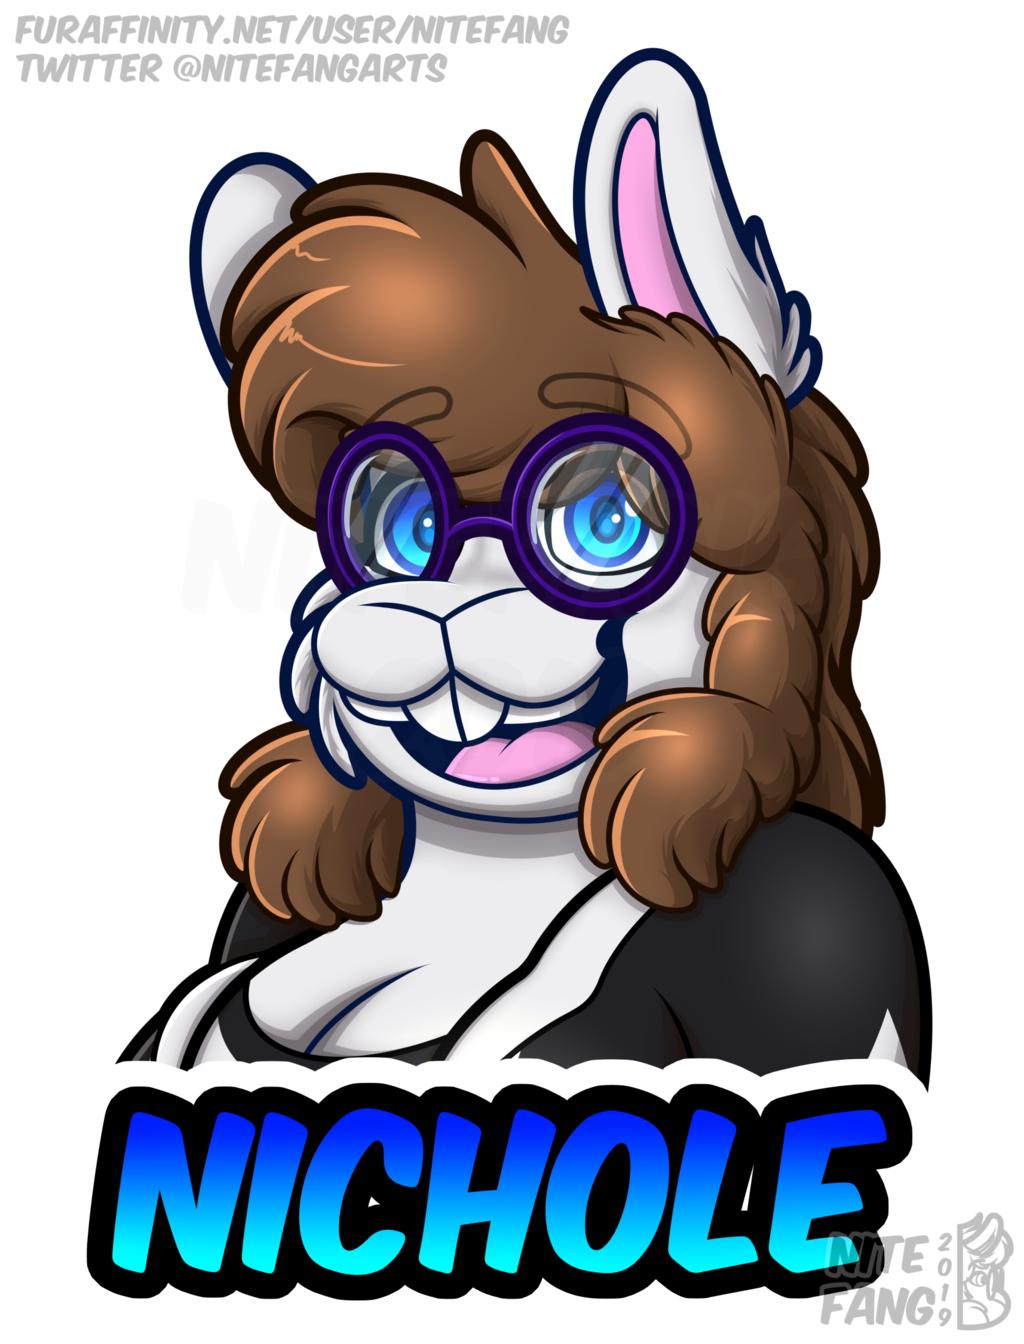 {P} Nichole 2019 Badge - Normal